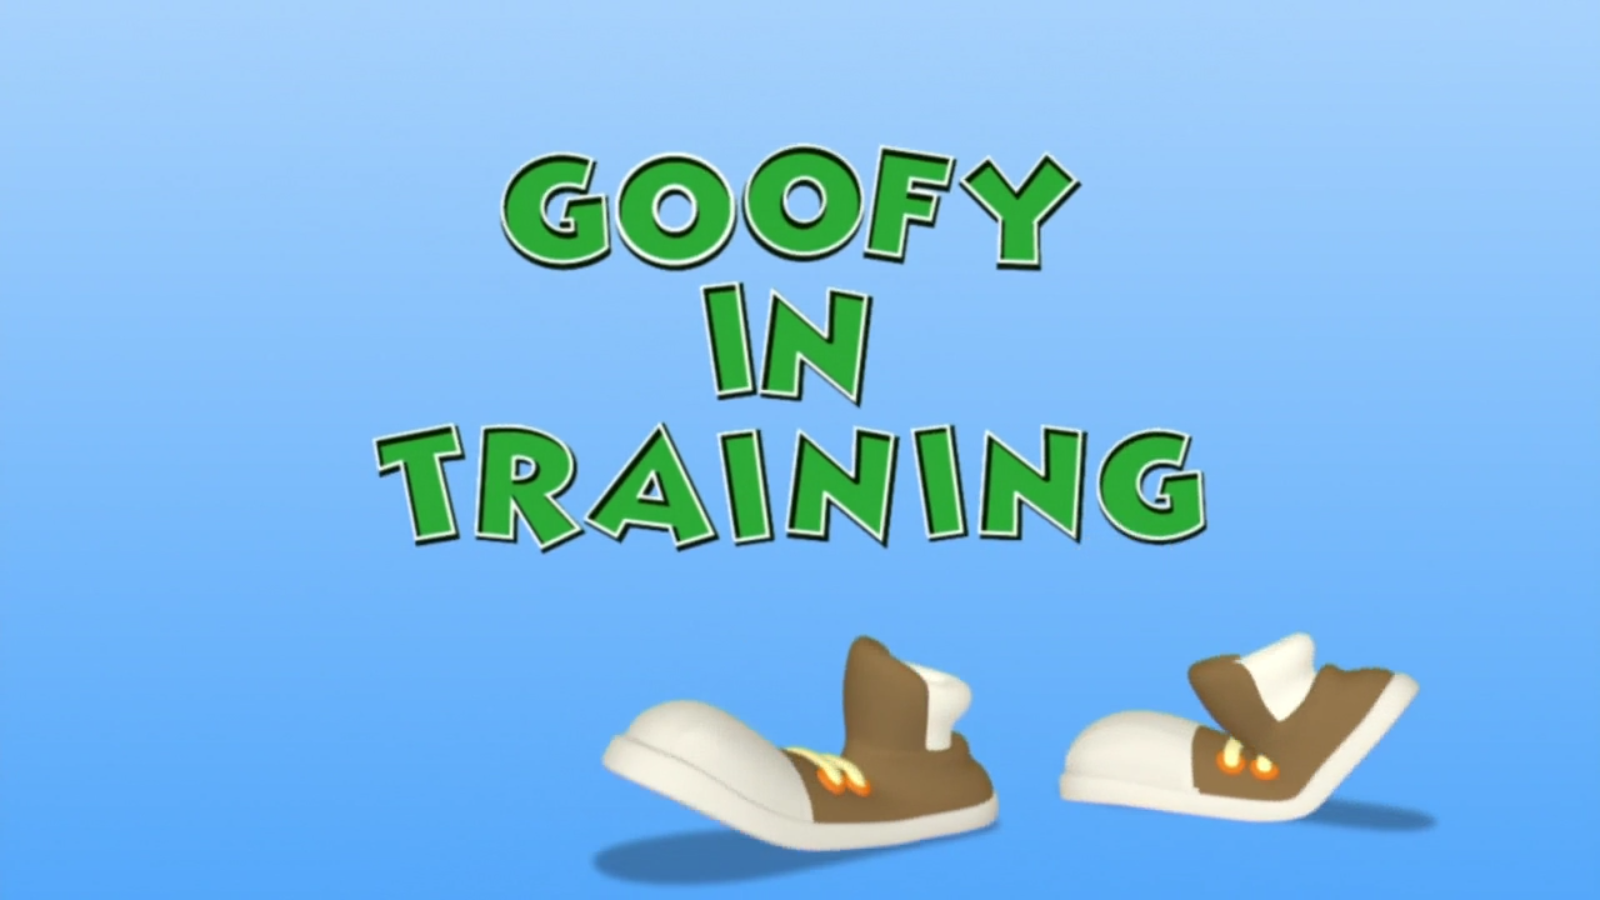 Goofy in Training